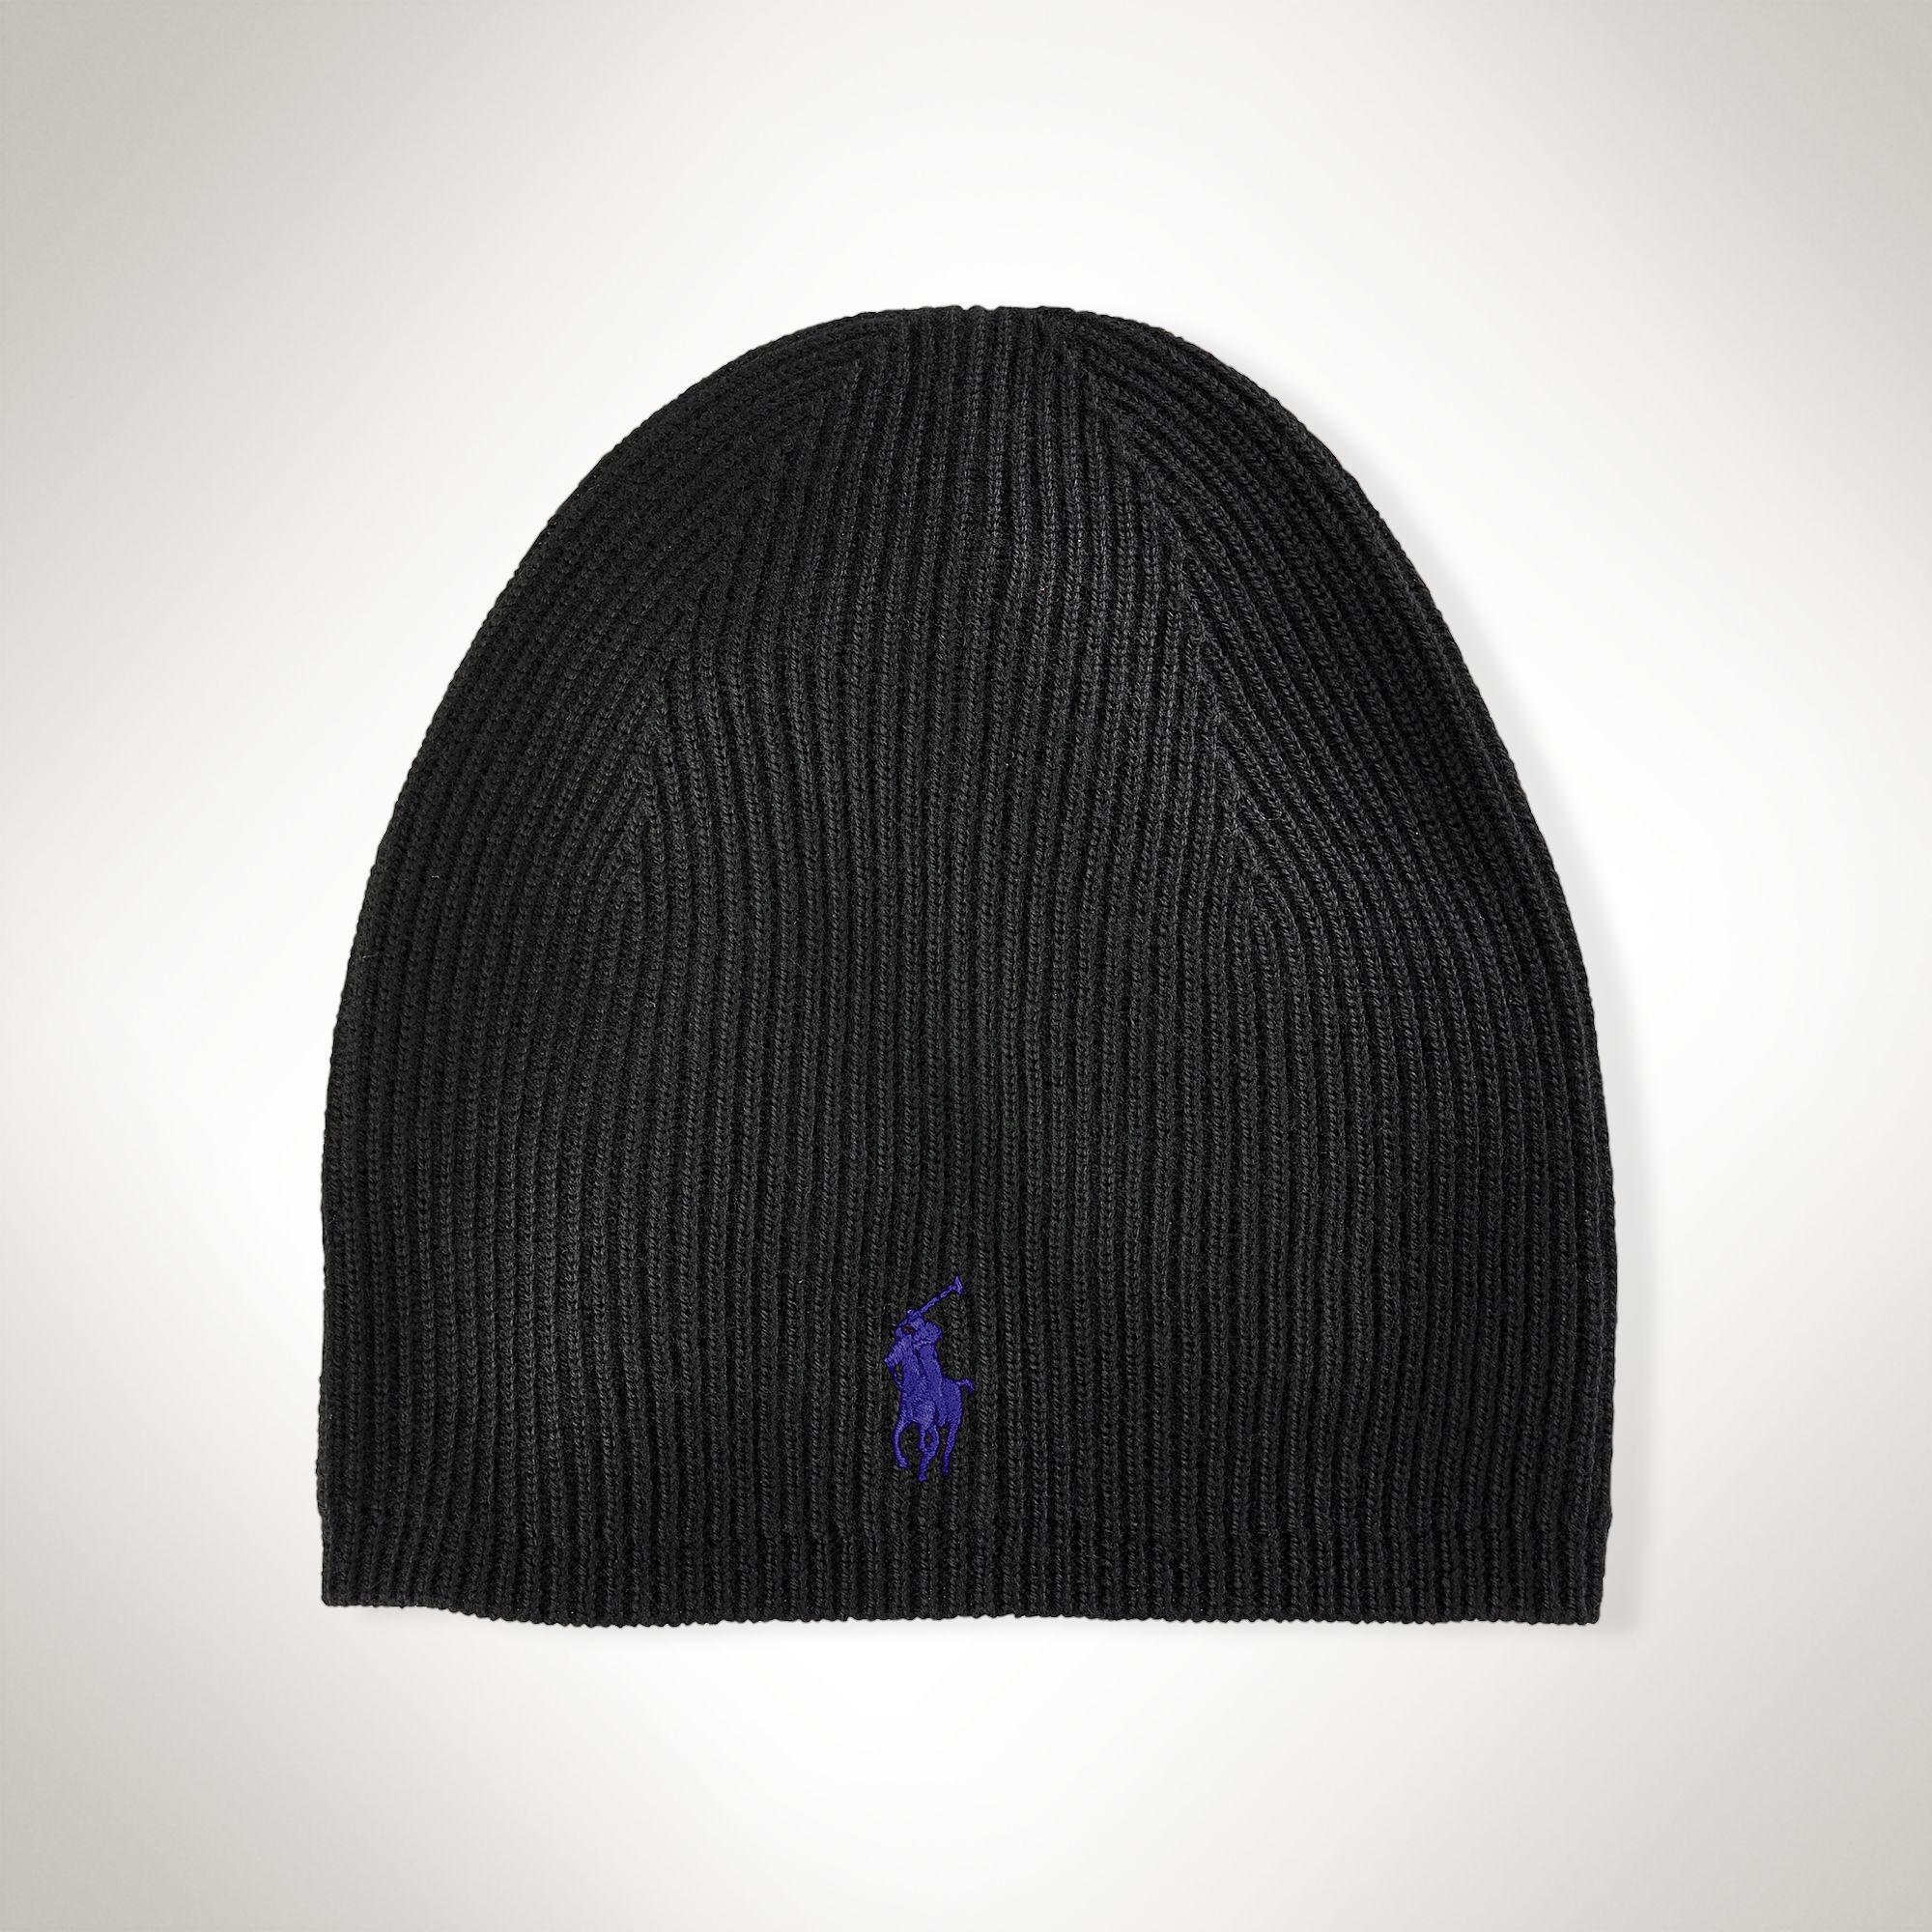 polo ralph lauren merino wool skull cap in black for men. Black Bedroom Furniture Sets. Home Design Ideas